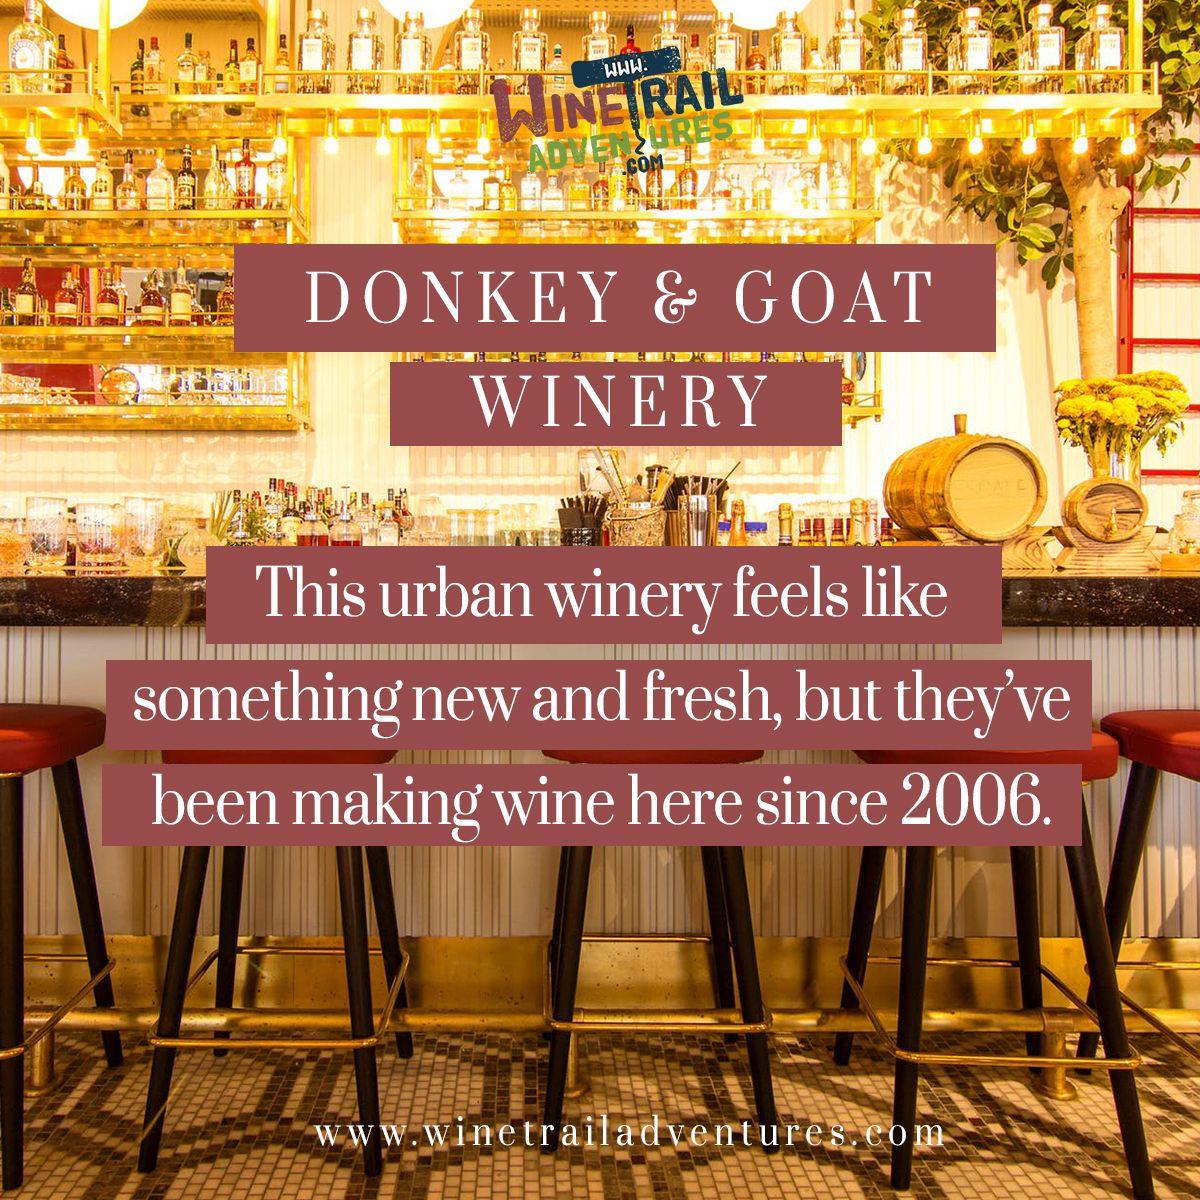 Donkey Goat Winery Tasting Room Winery Tasting Room Tasting Room Wine Making